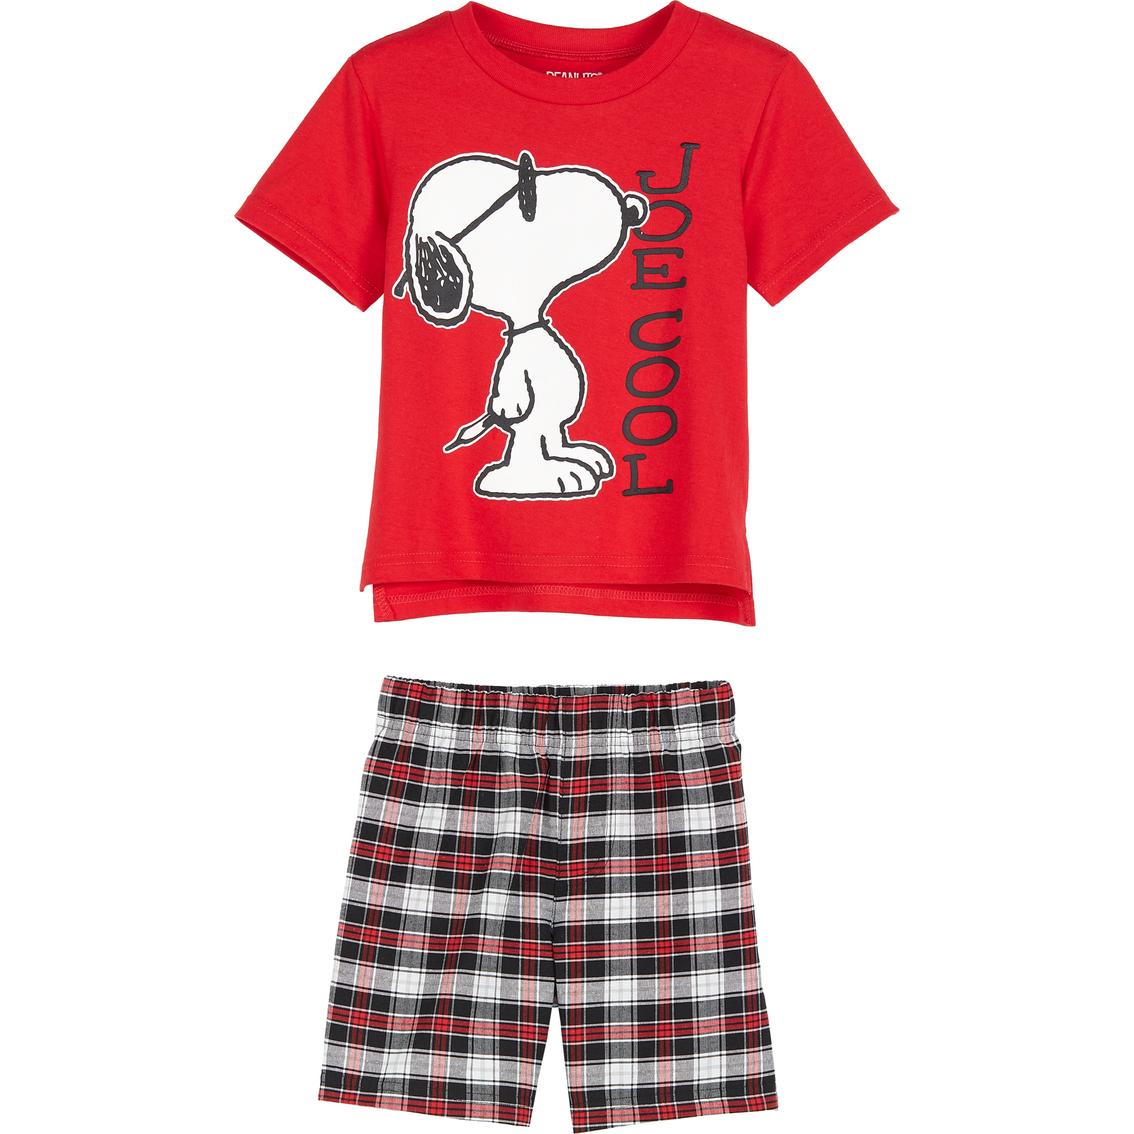 Peanuts Boys Toddler Easter 2 Piece Cotton Set